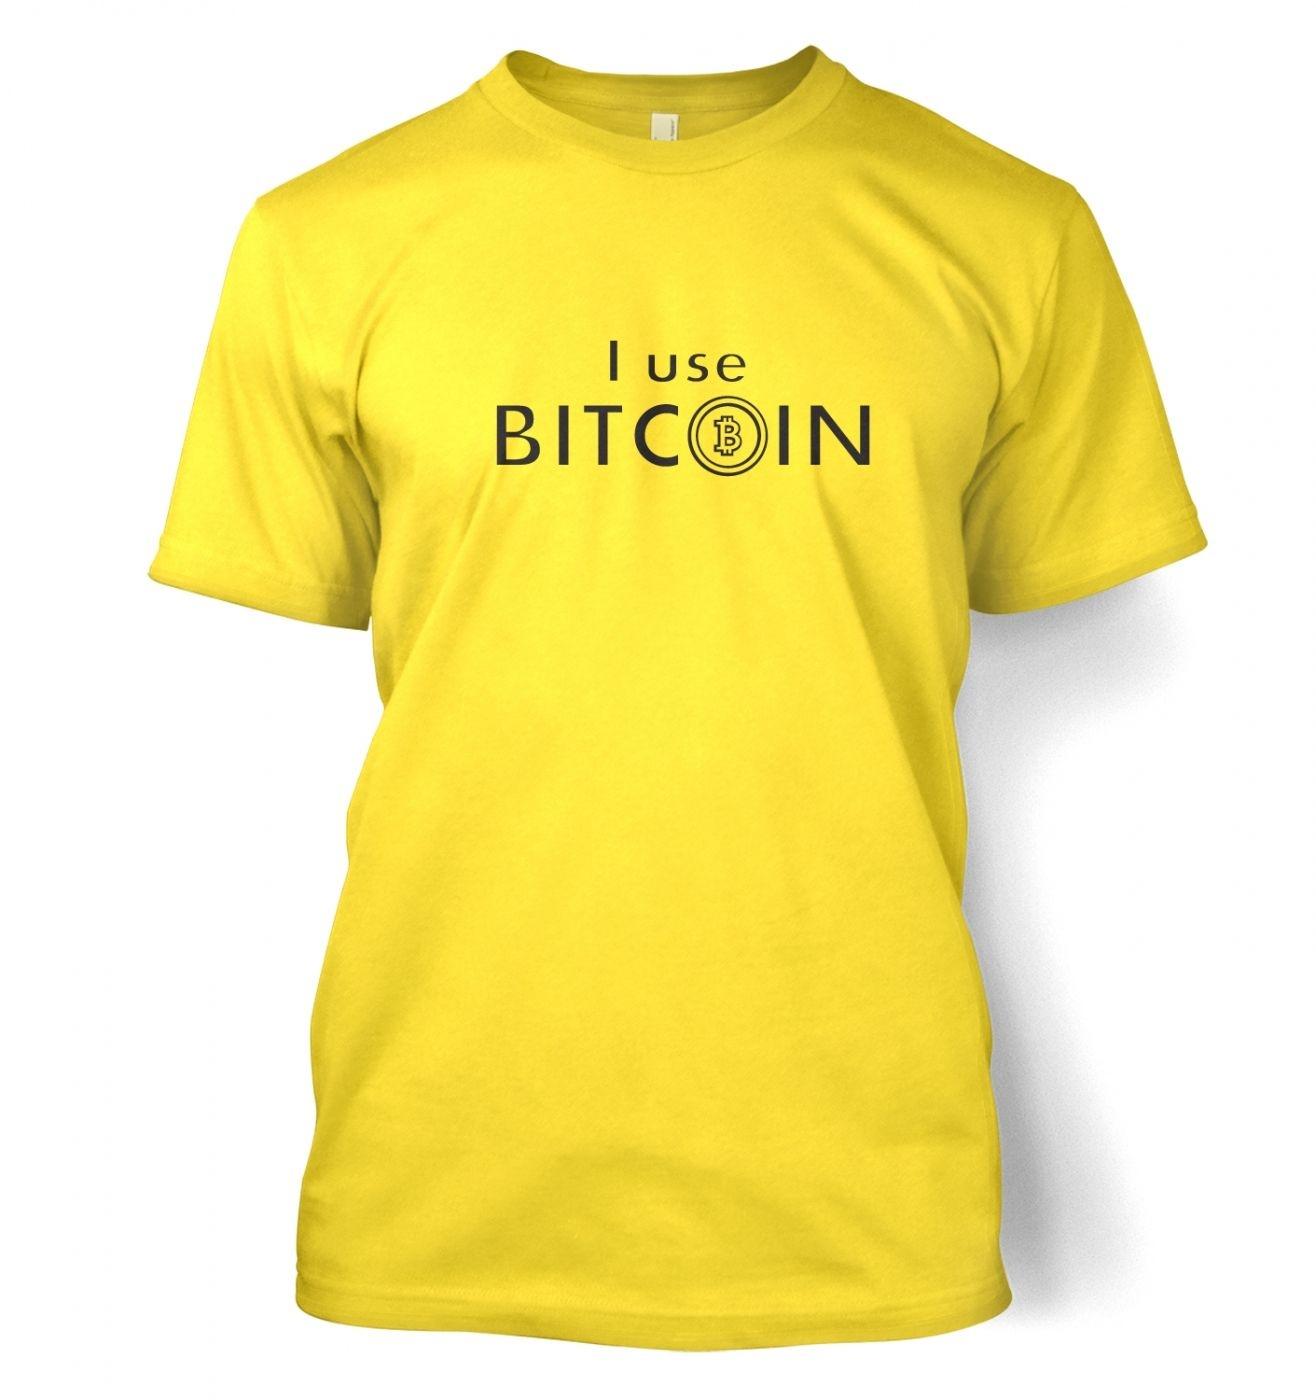 I Use Bitcoin t-shirt